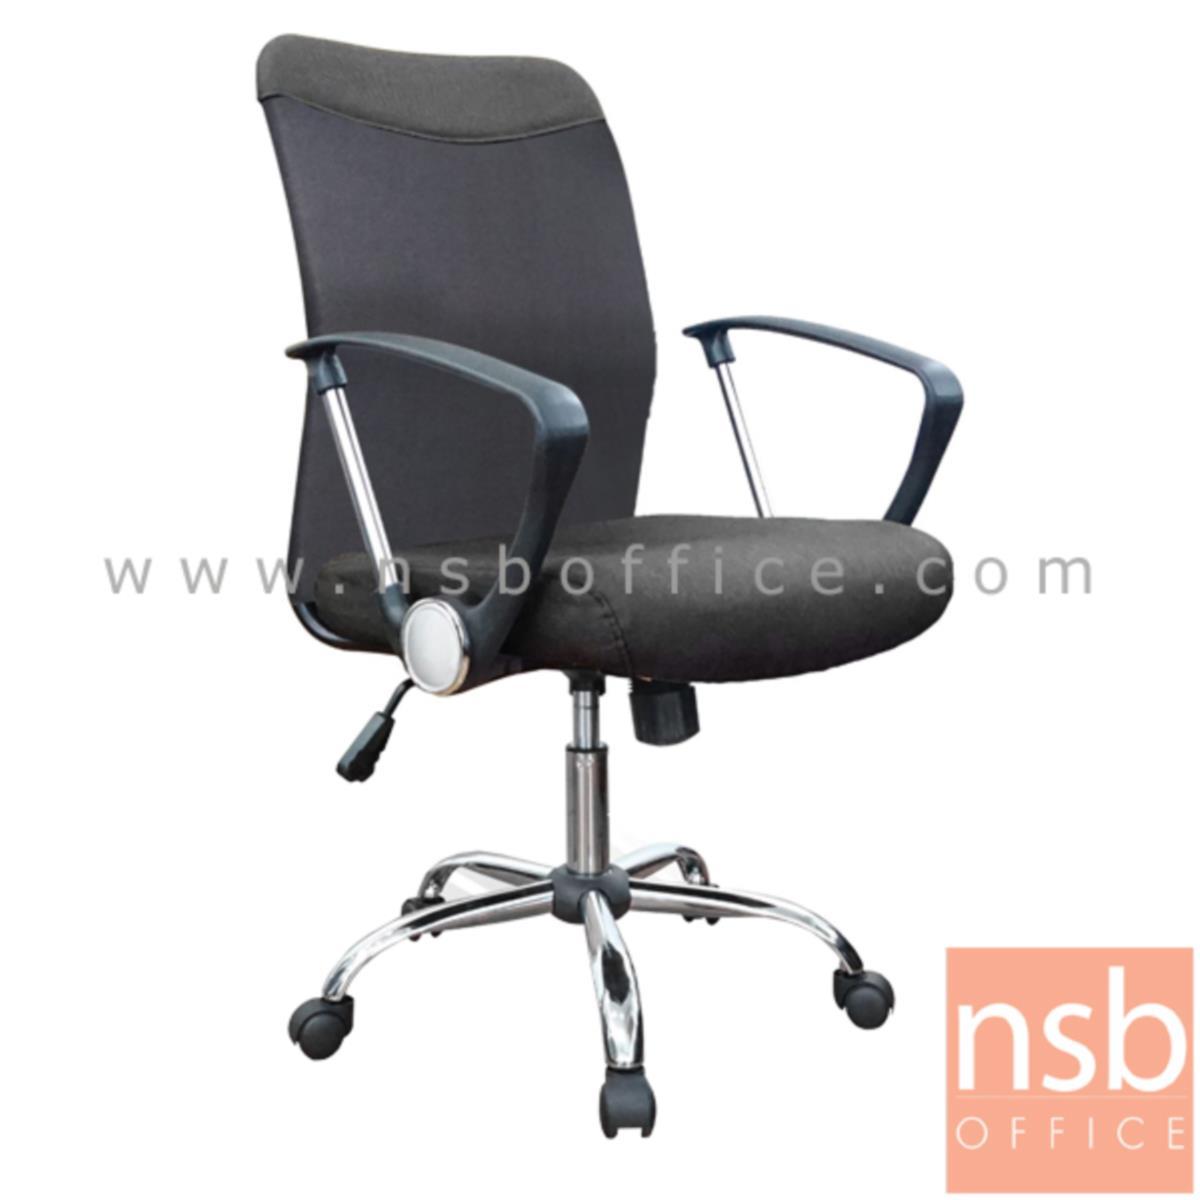 B28A092:เก้าอี้สำนักงาน รุ่น Veniero  โช๊คแก๊ส มีก้อนโยก ขาเหล็กชุบโครเมี่ยม